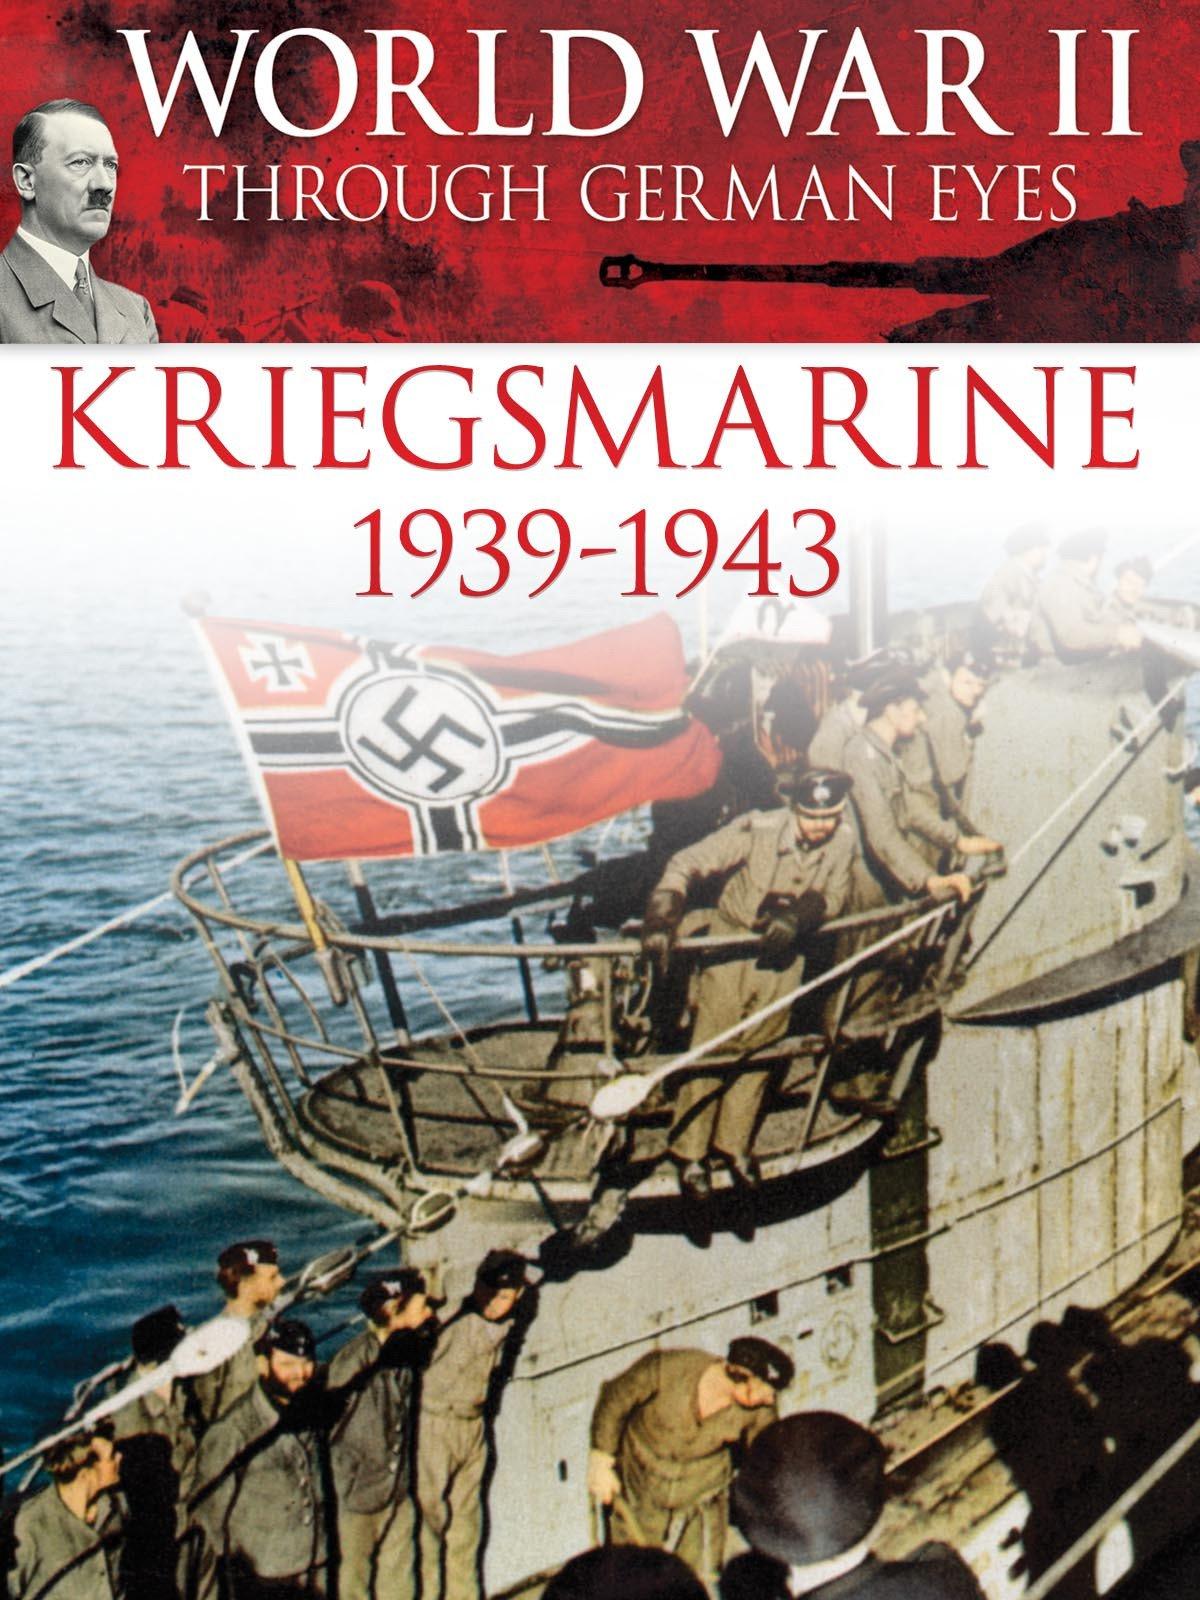 World War II Through German Eyes: Kriegsmarine 1939-1943 on Amazon Prime Video UK